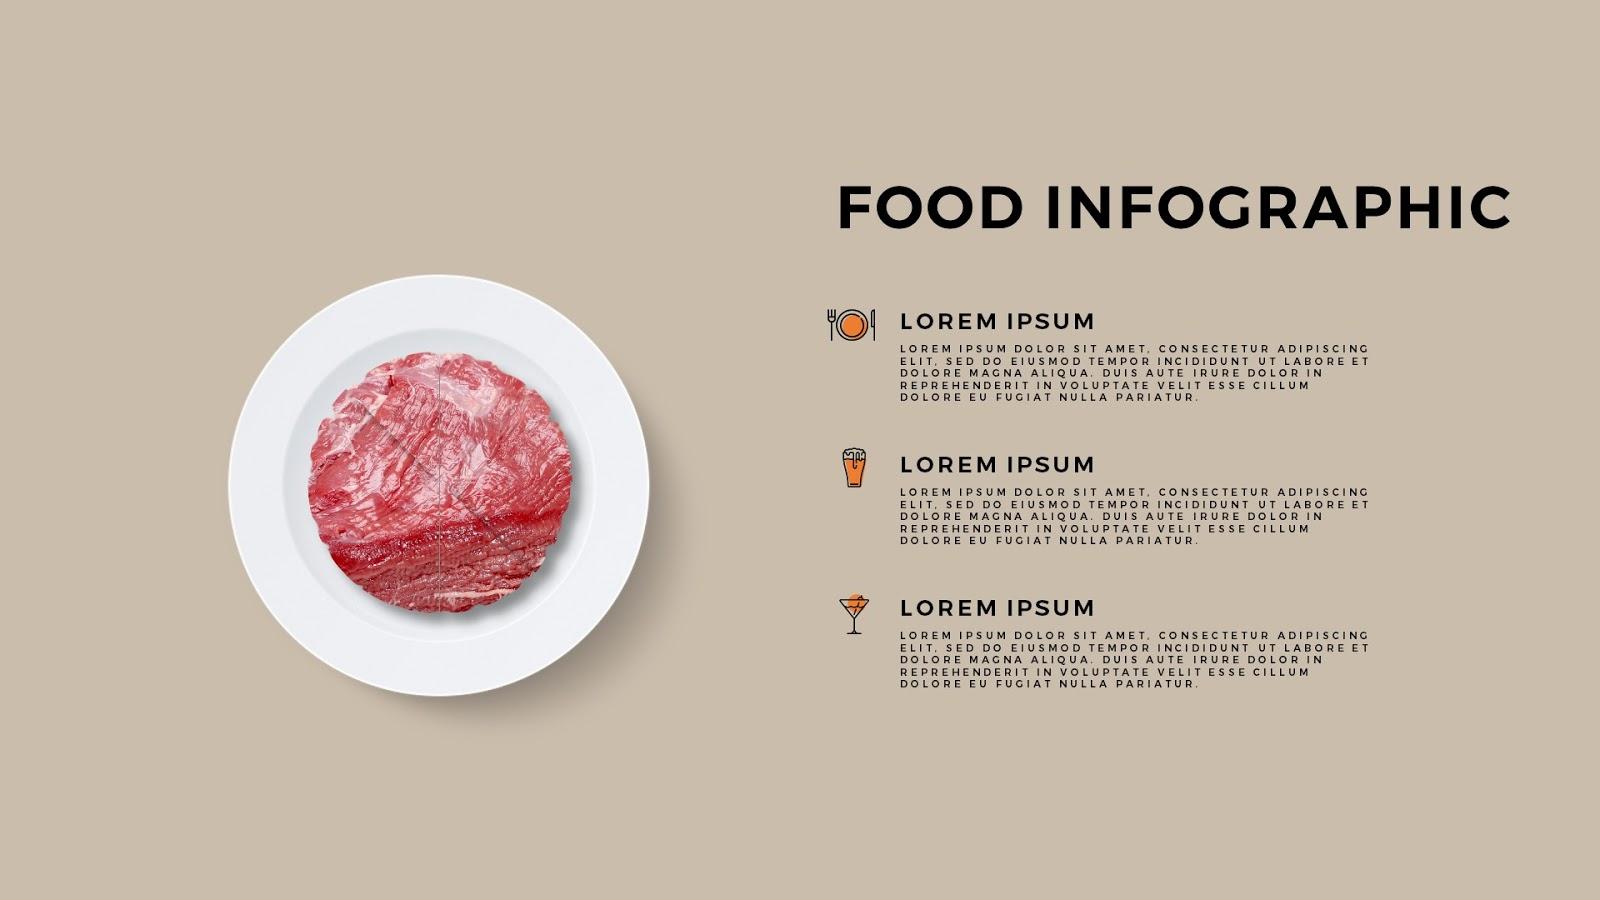 Food infographic presentation with beef for powerpoint infographicon food infographic elements of beef for powerpoint template with colored background toneelgroepblik Gallery